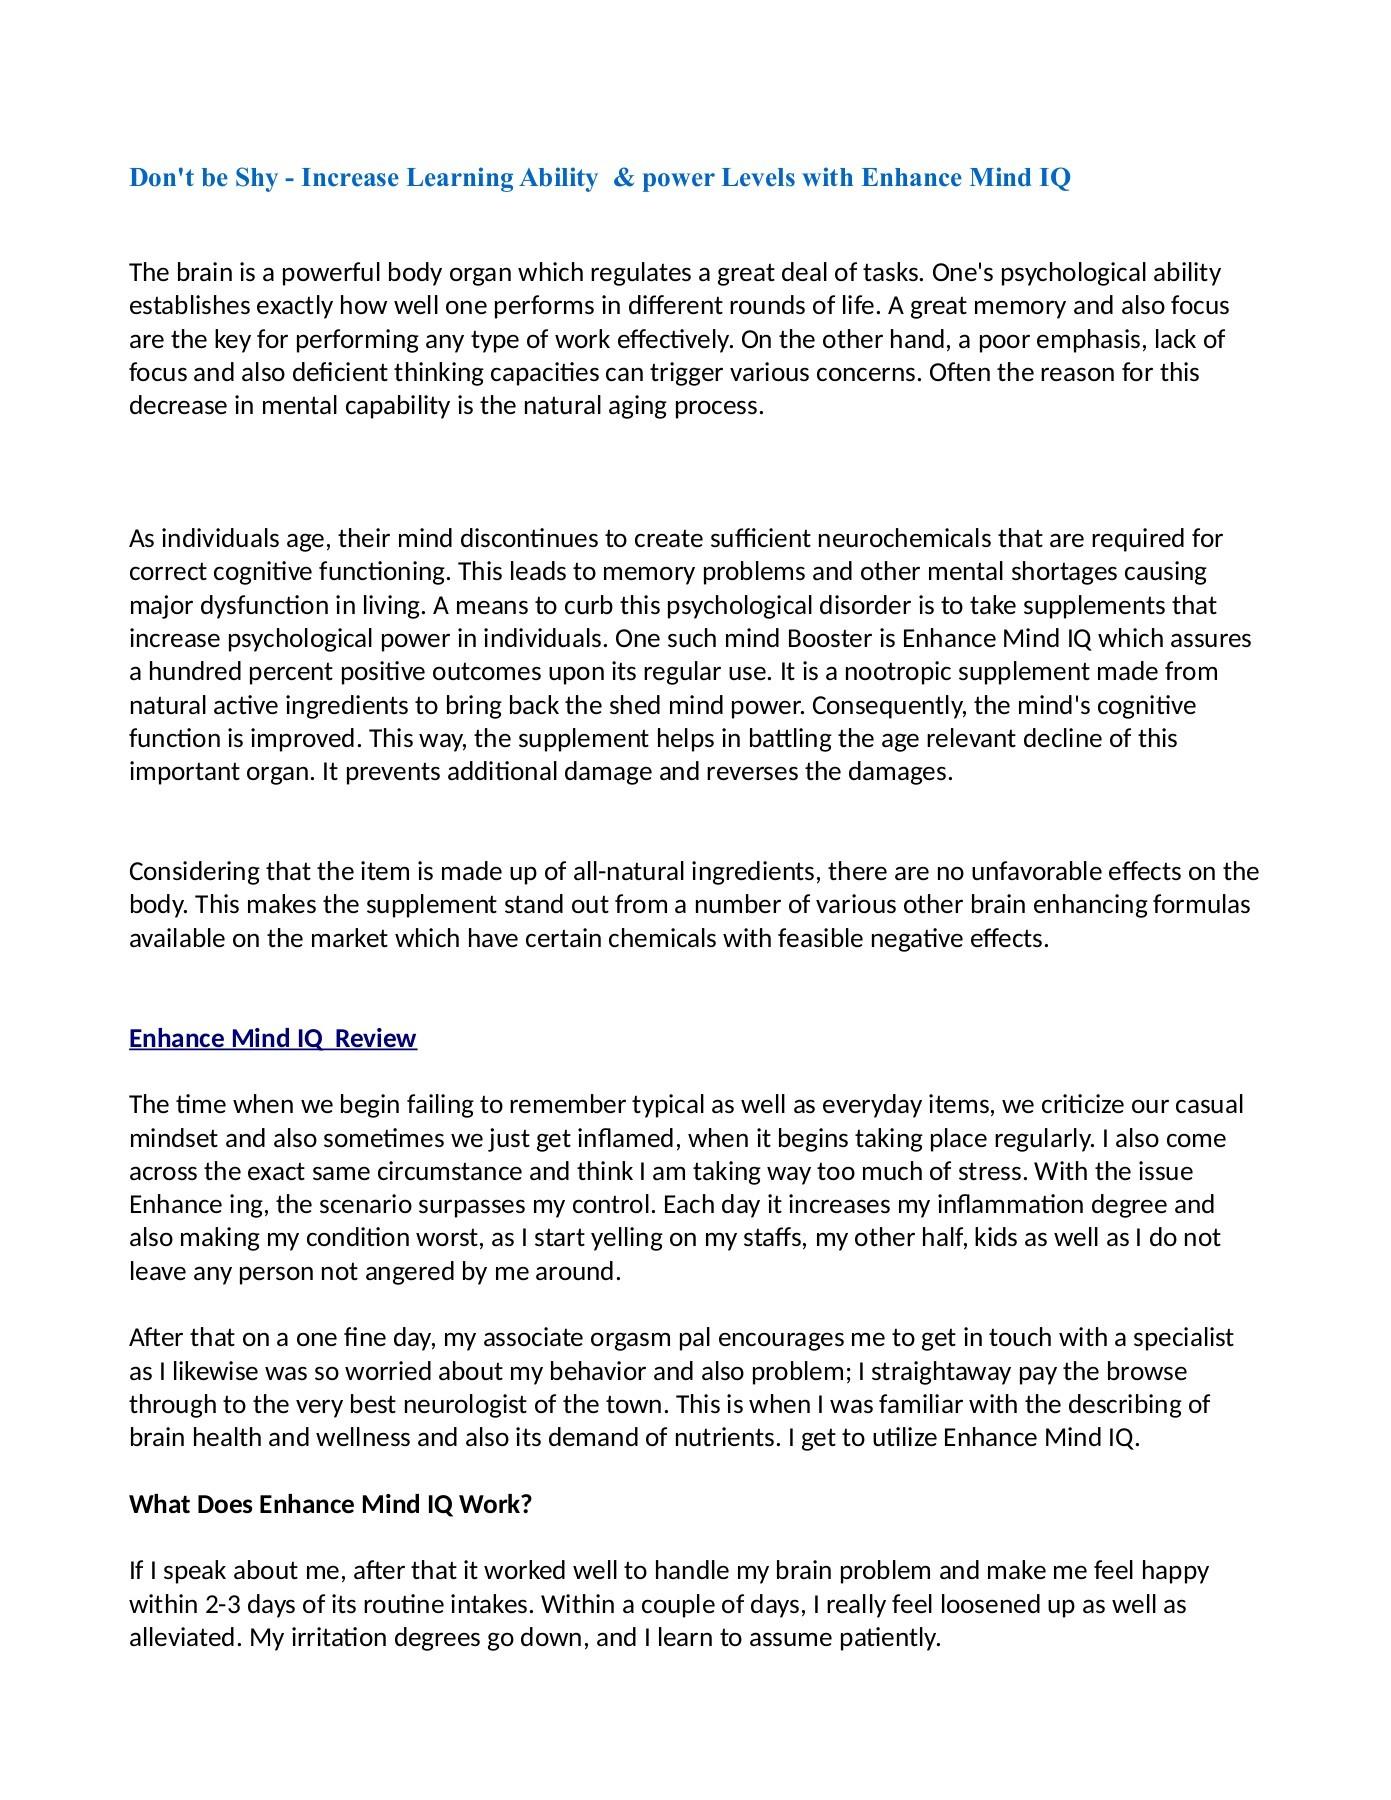 Eye Pages Text Version Pages Text Enhance Iq Customer Service Enhance Iq Website houzz-03 Enhance Mind Iq